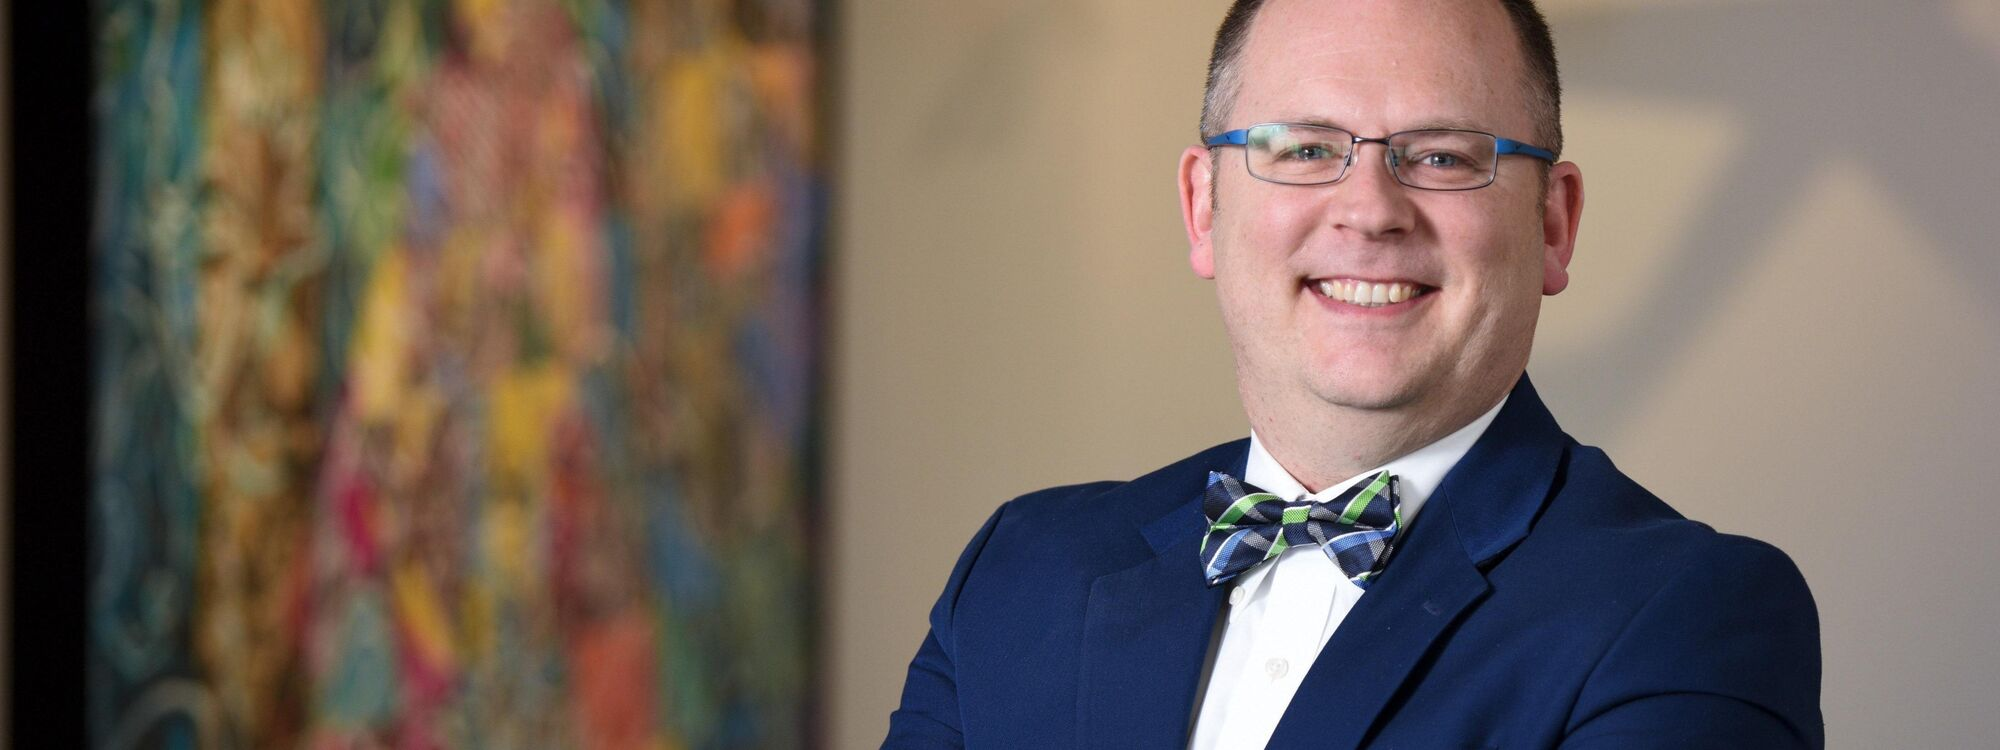 Jeremy Wells, senior vice president of Philanthropic Services